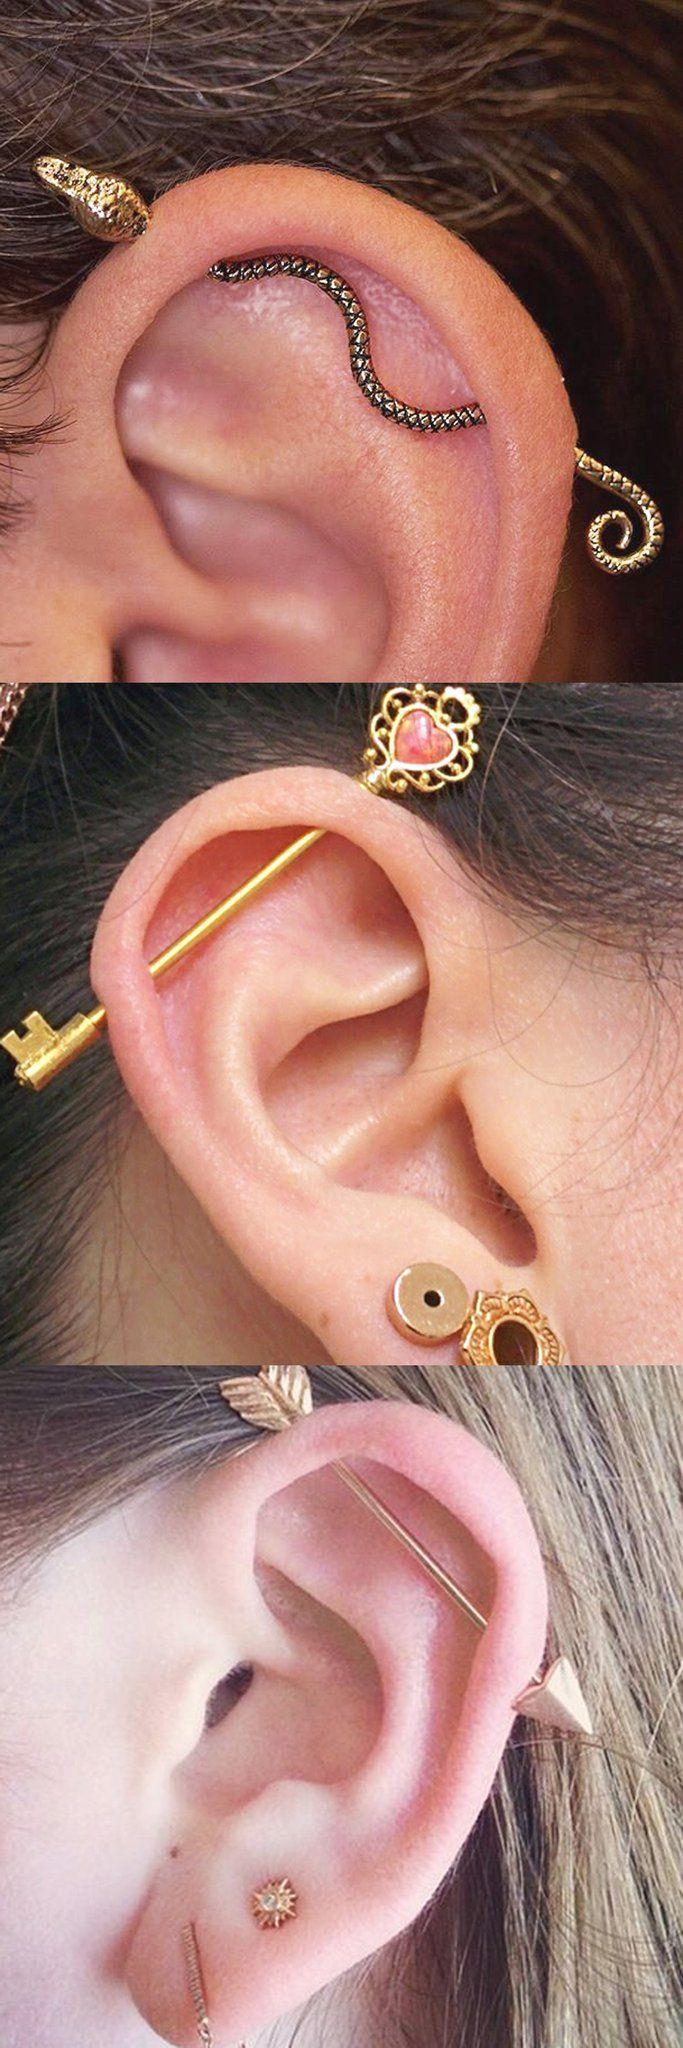 Delicate Ear Piercing Ideas at MyBodiart.com - Industrial 14G Barbell 14G Gold Upper Earring Bar